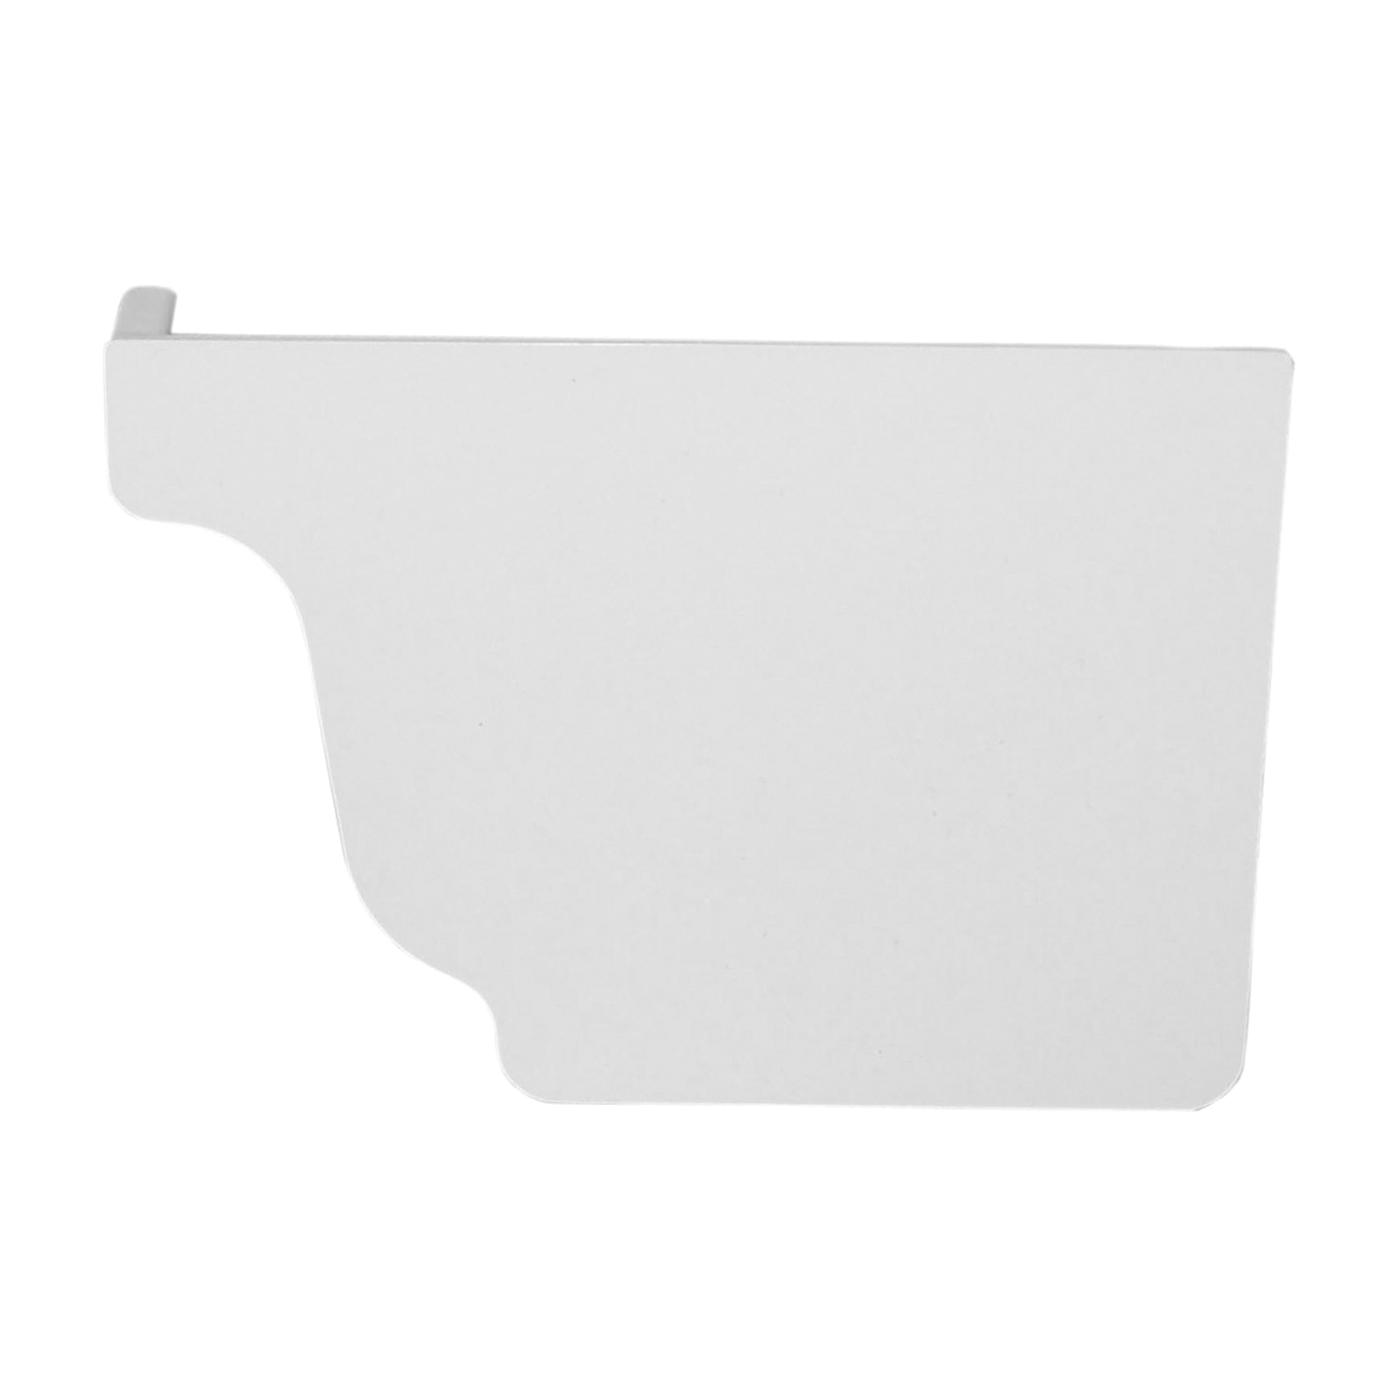 Picture of GENOVA AW101K Gutter End Cap, 3.6 in L, 1.1 in W, Vinyl, White, For: 5 in Repla K Gutter